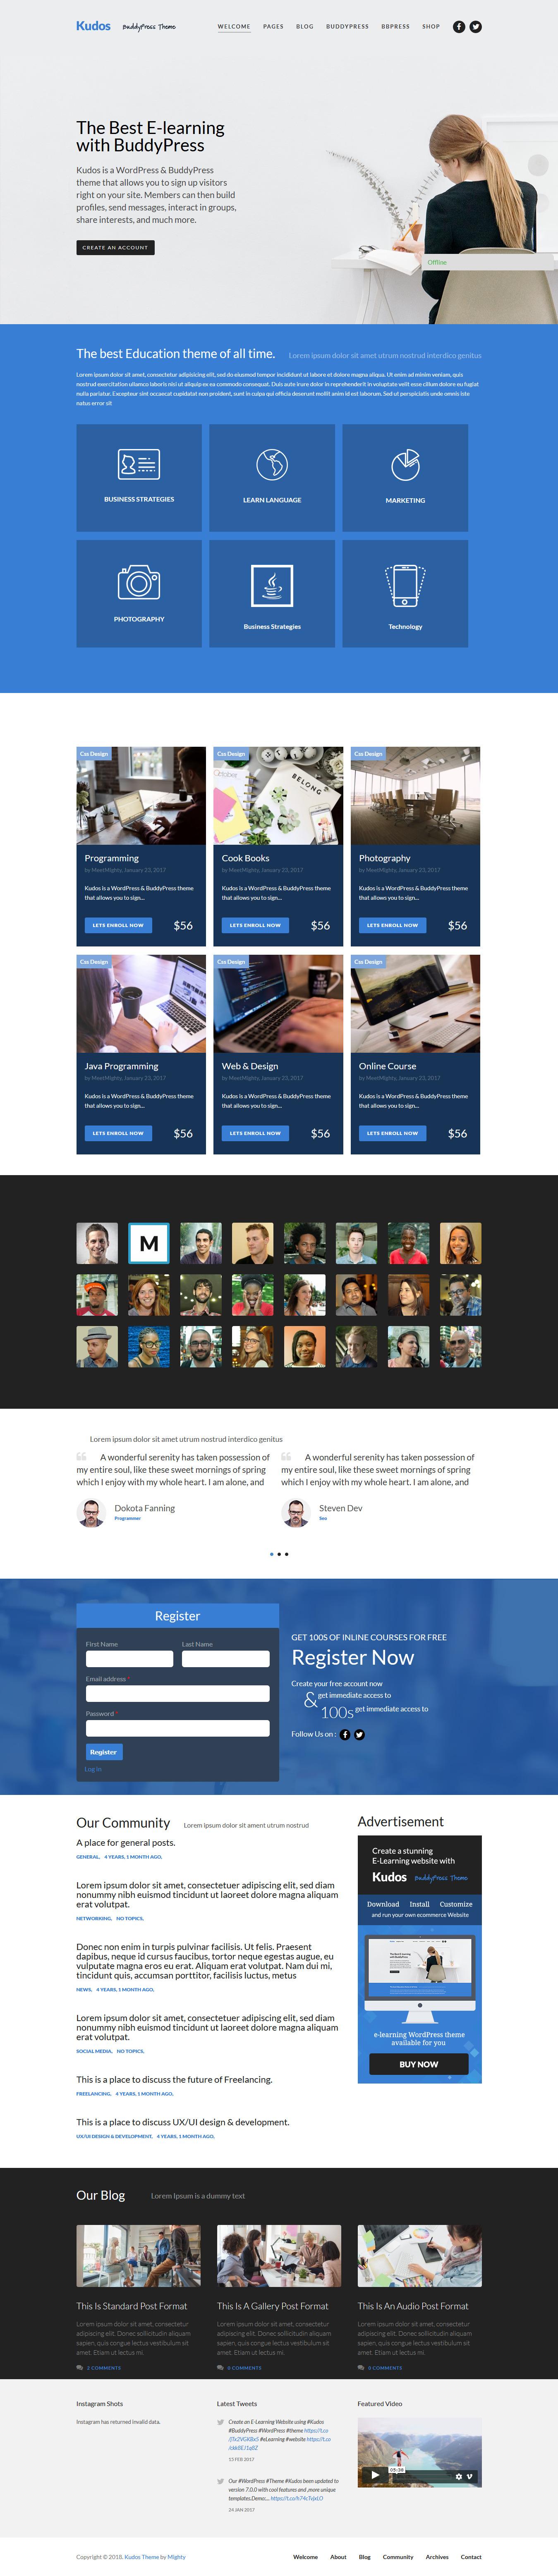 kudos best premium buddypress wordpress theme 1 - 10+ Best Premium BuddyPress WordPress Themes